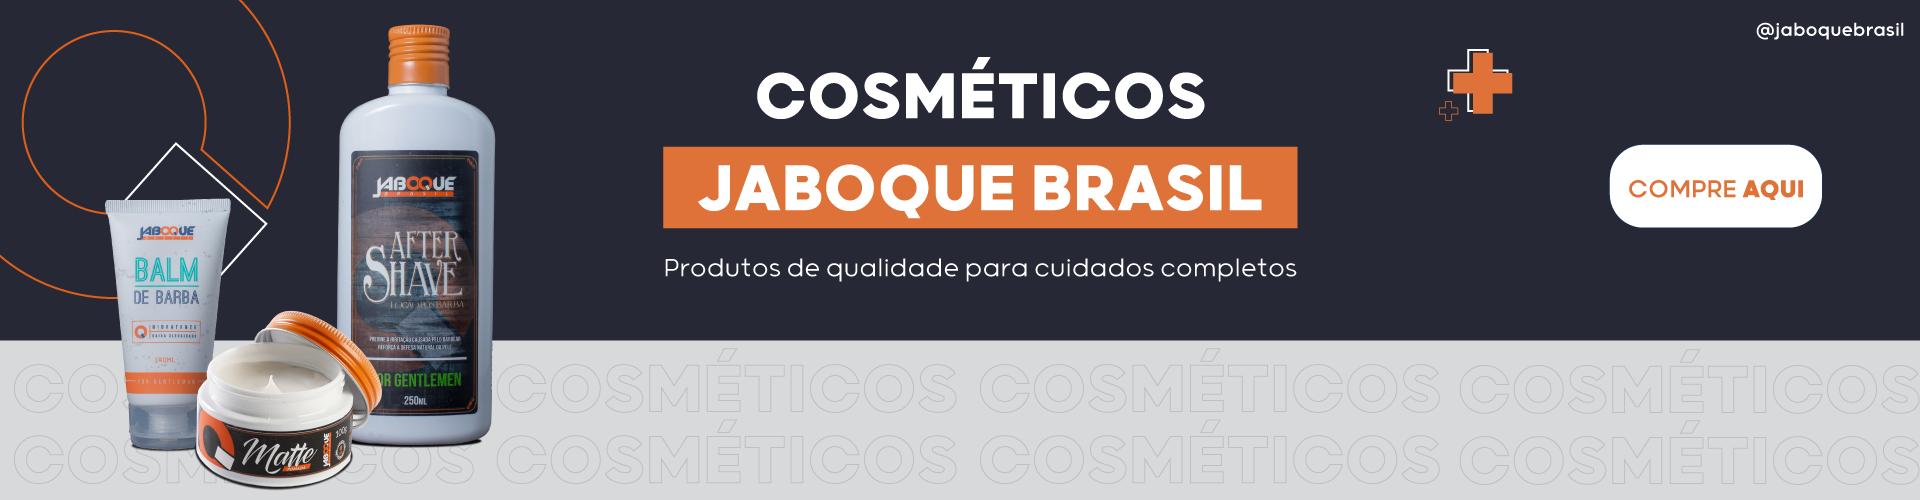 Cosmeticos JB - Rafaella